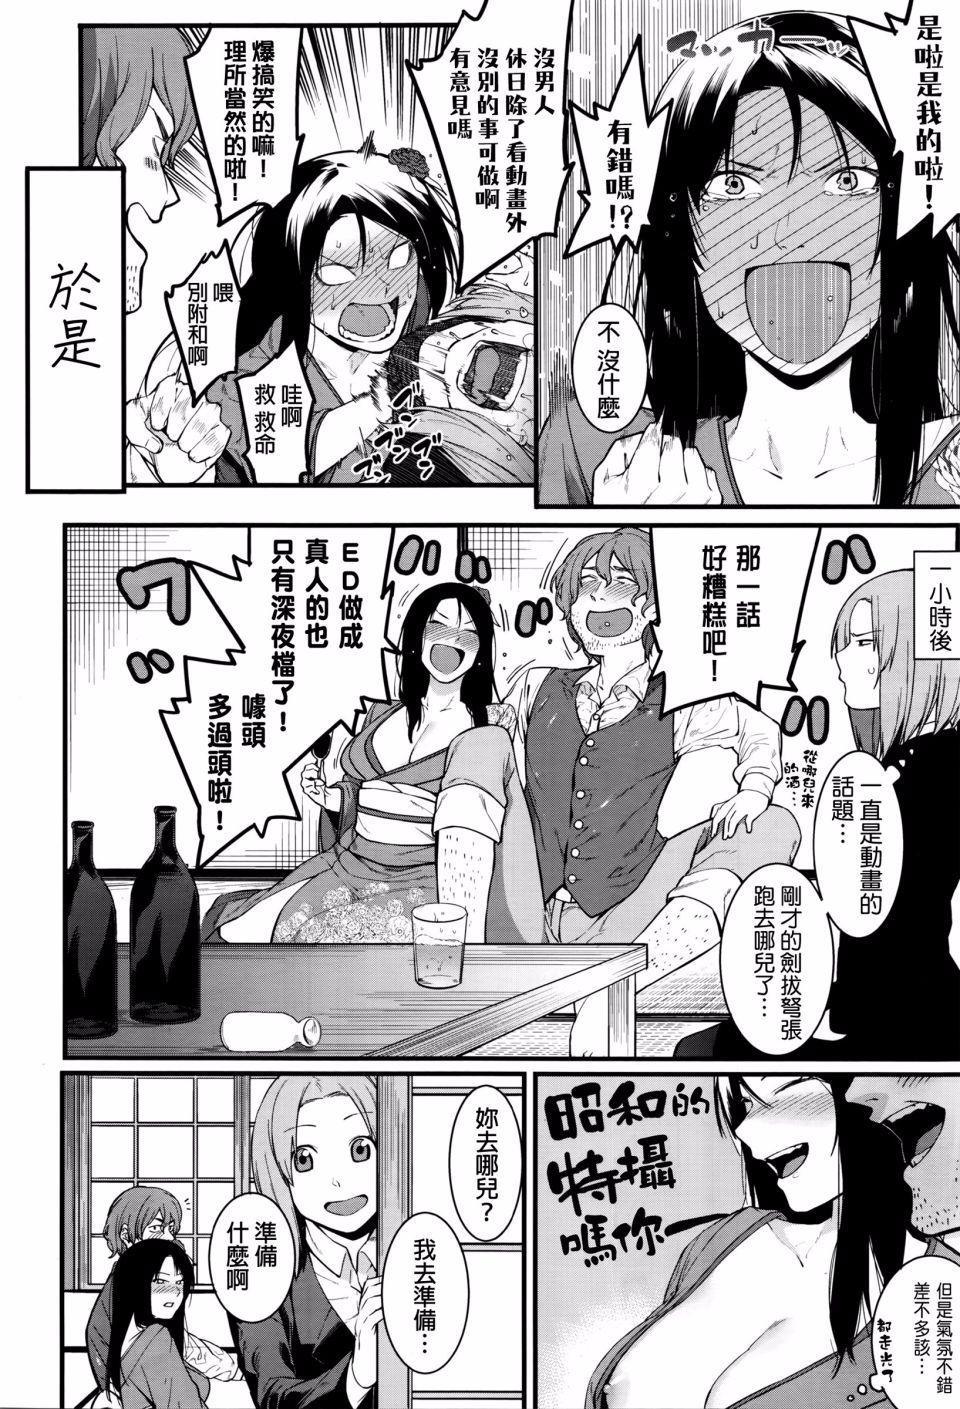 Fukurai Re to leftovers 5